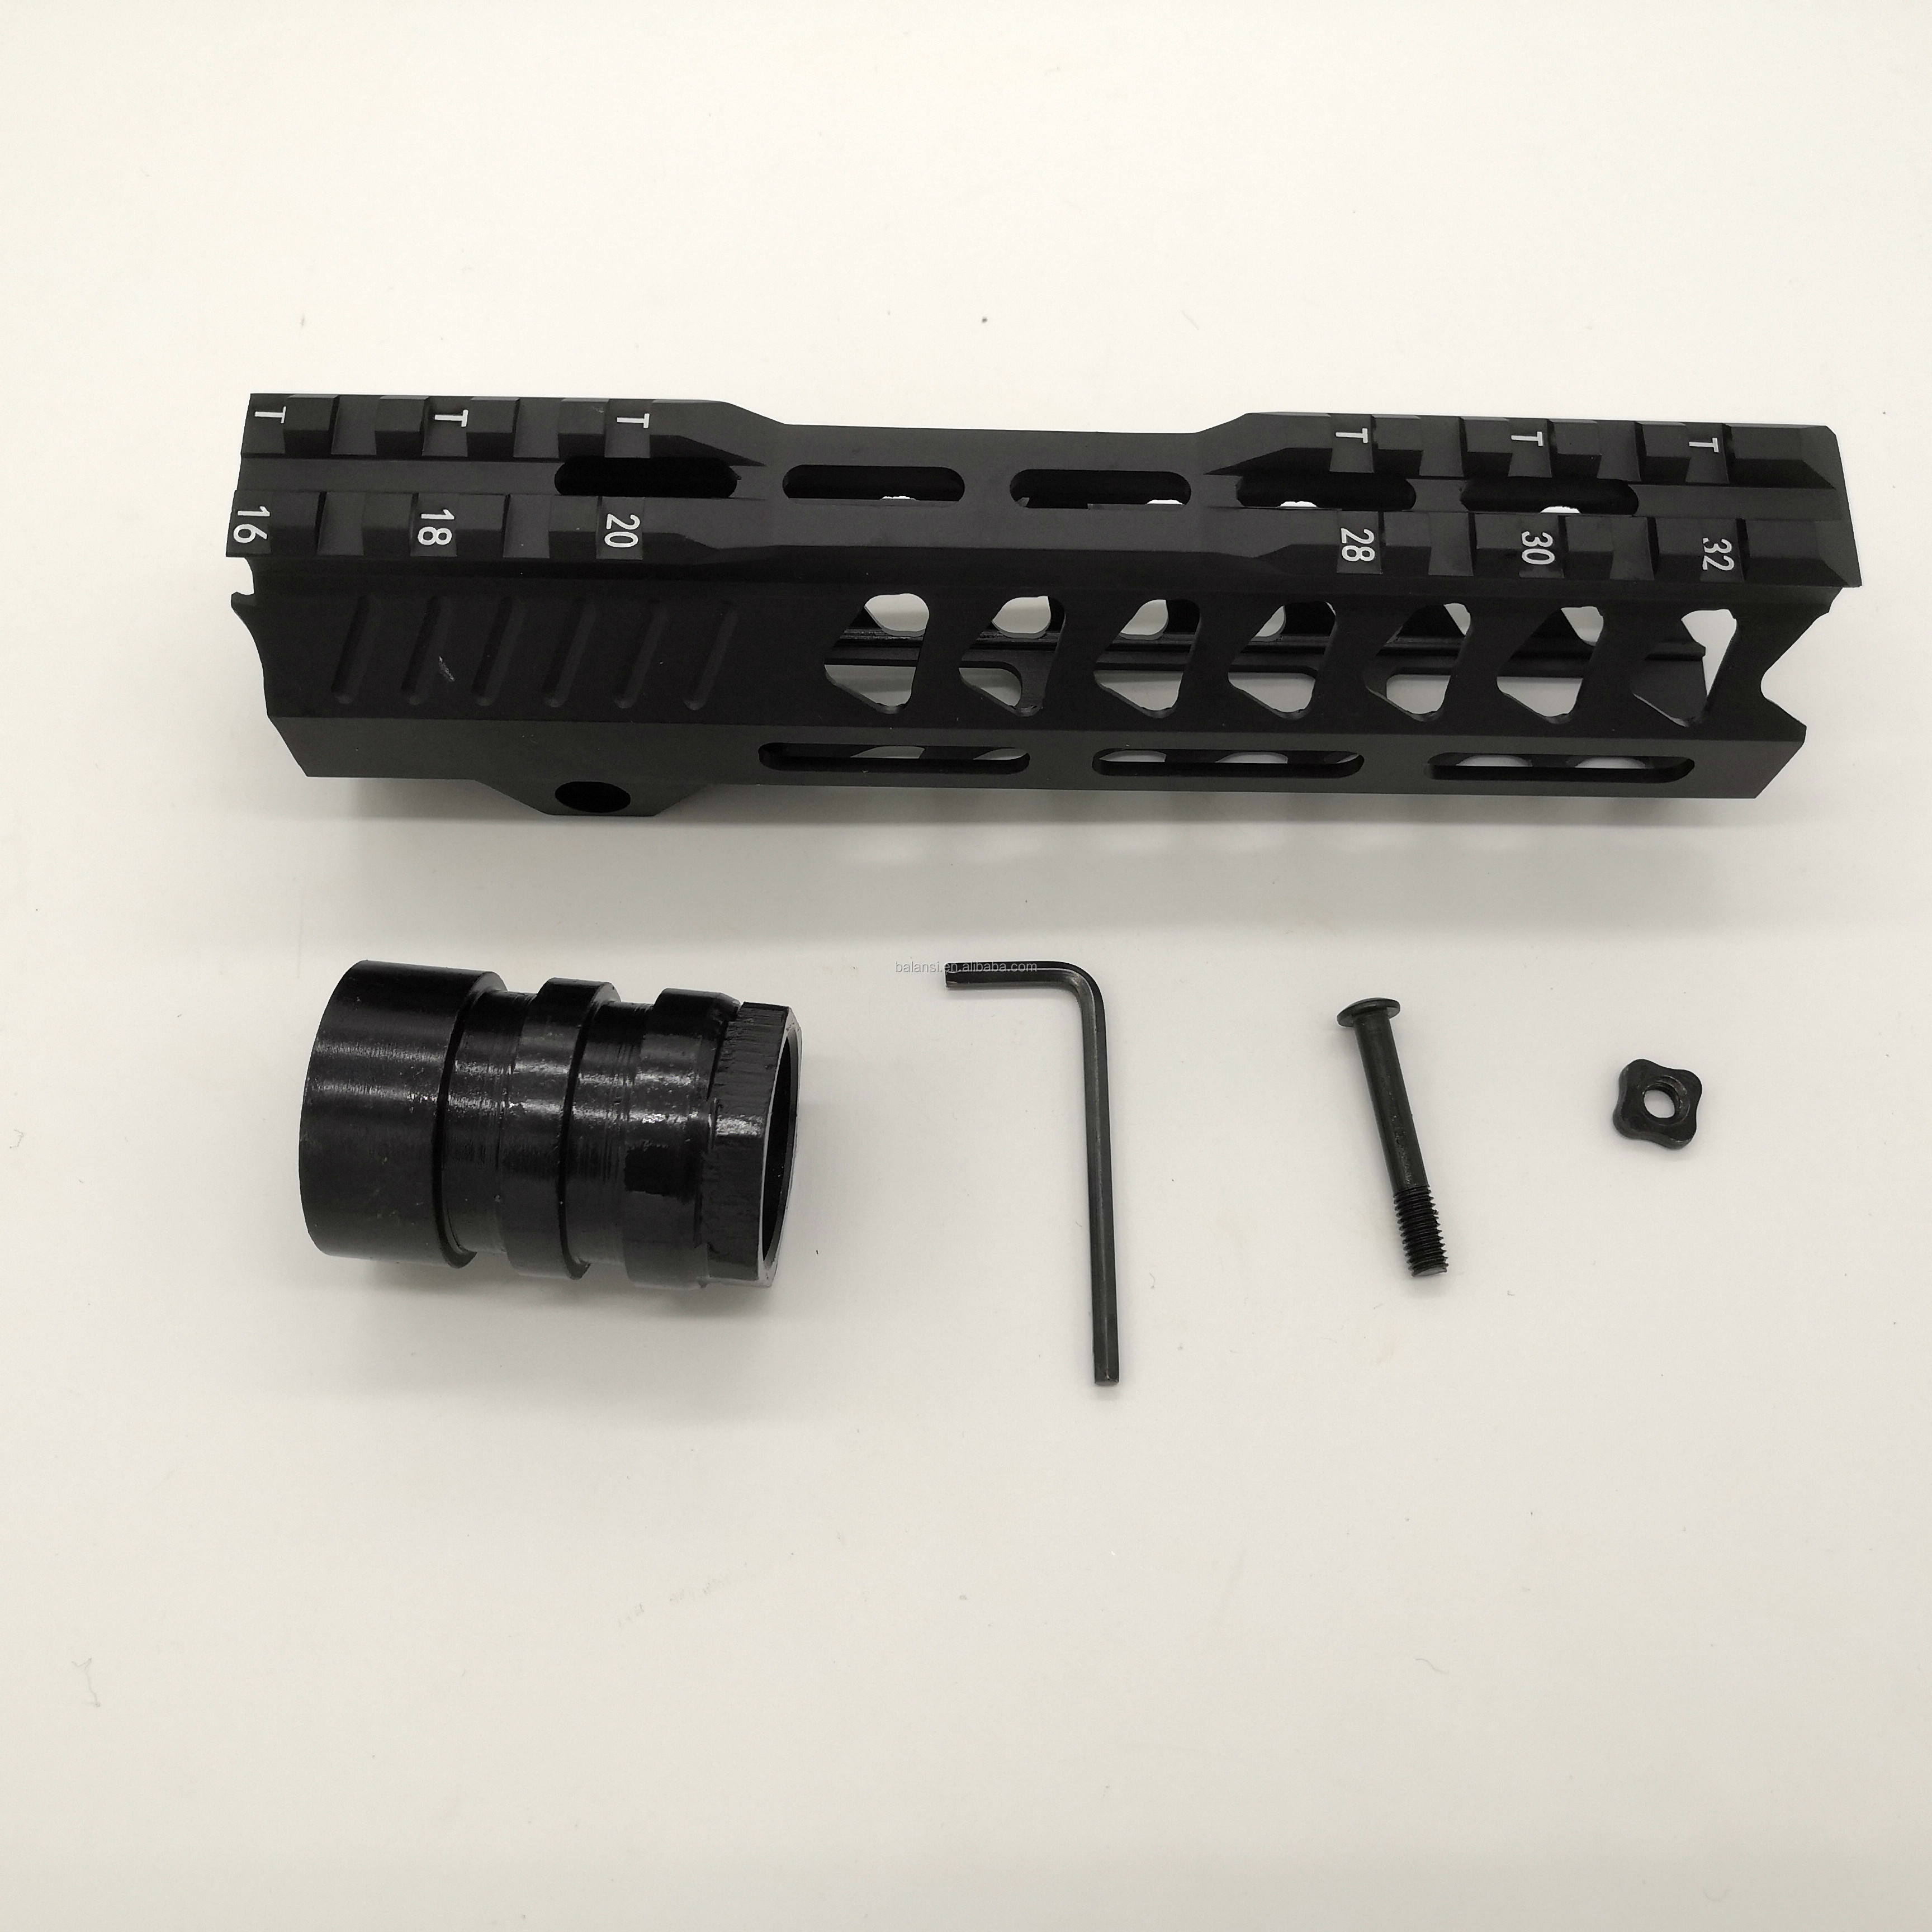 7 inch tactical ar15 .223 5.56 mlok handguard Free Float Super Slim ar 15 Handguard Quad Rail steel Nut for AR15 M4 M16, Black